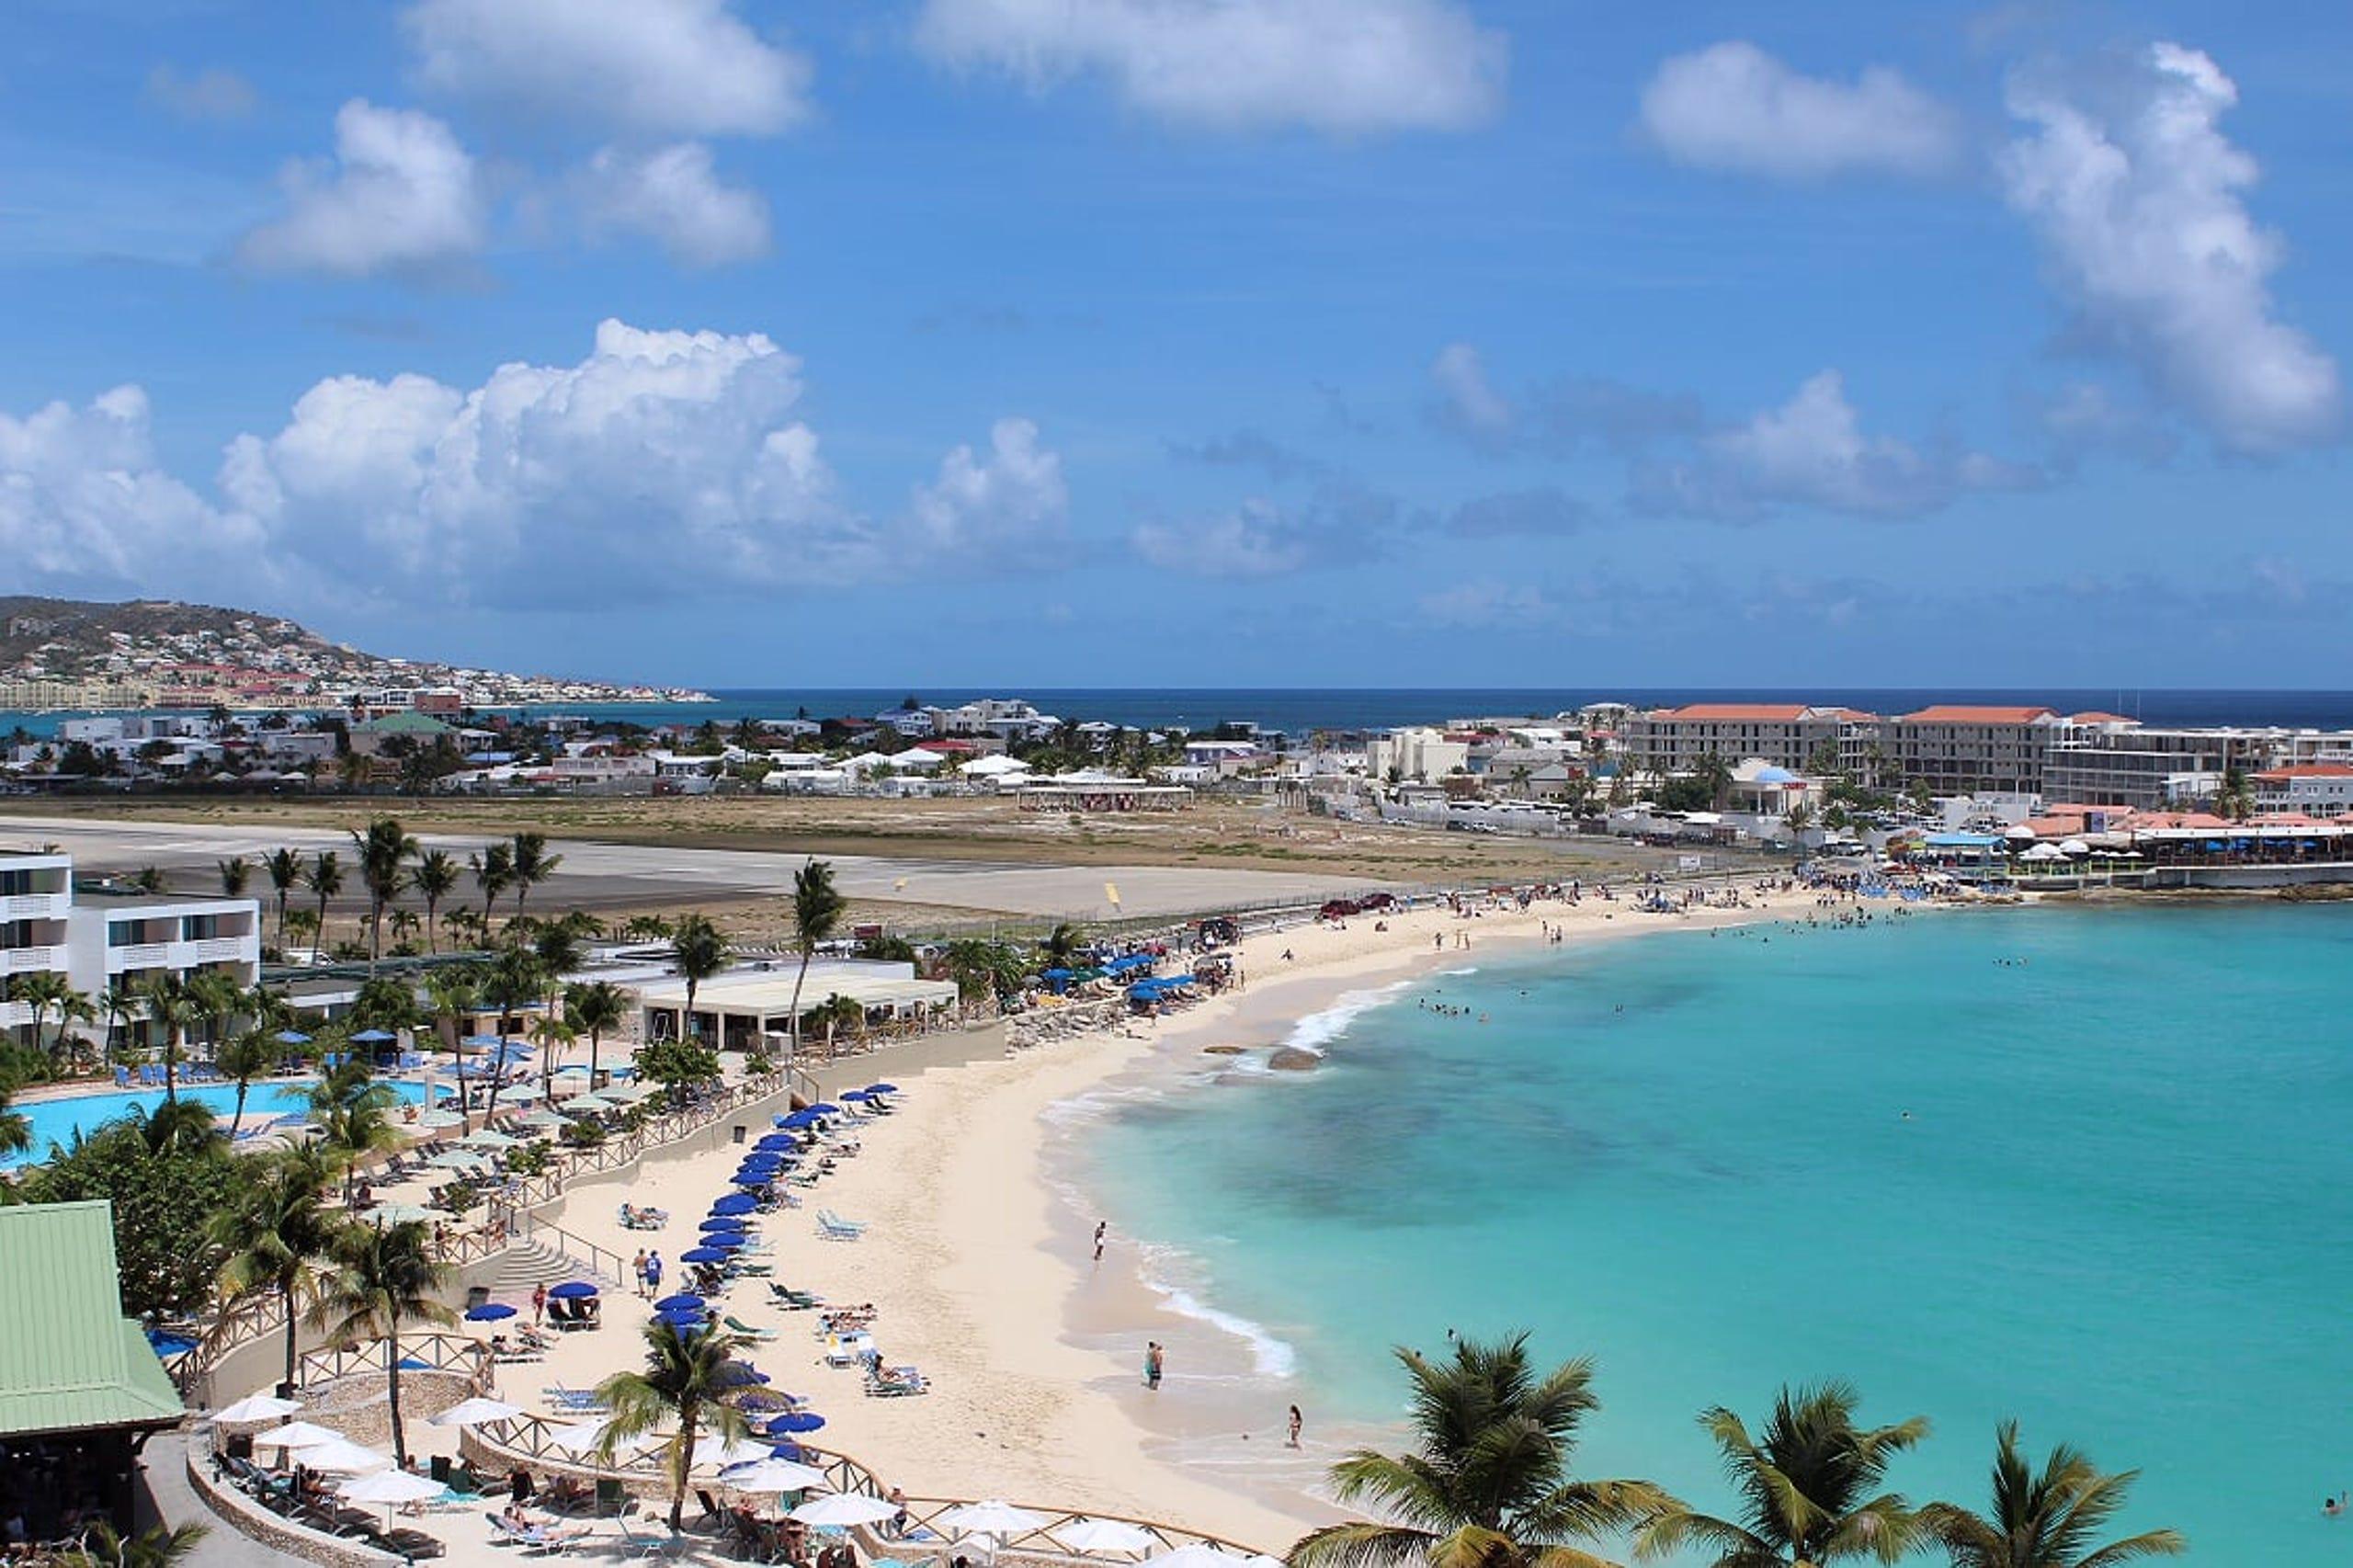 Resorts Rebuilt After Hurricane Irma